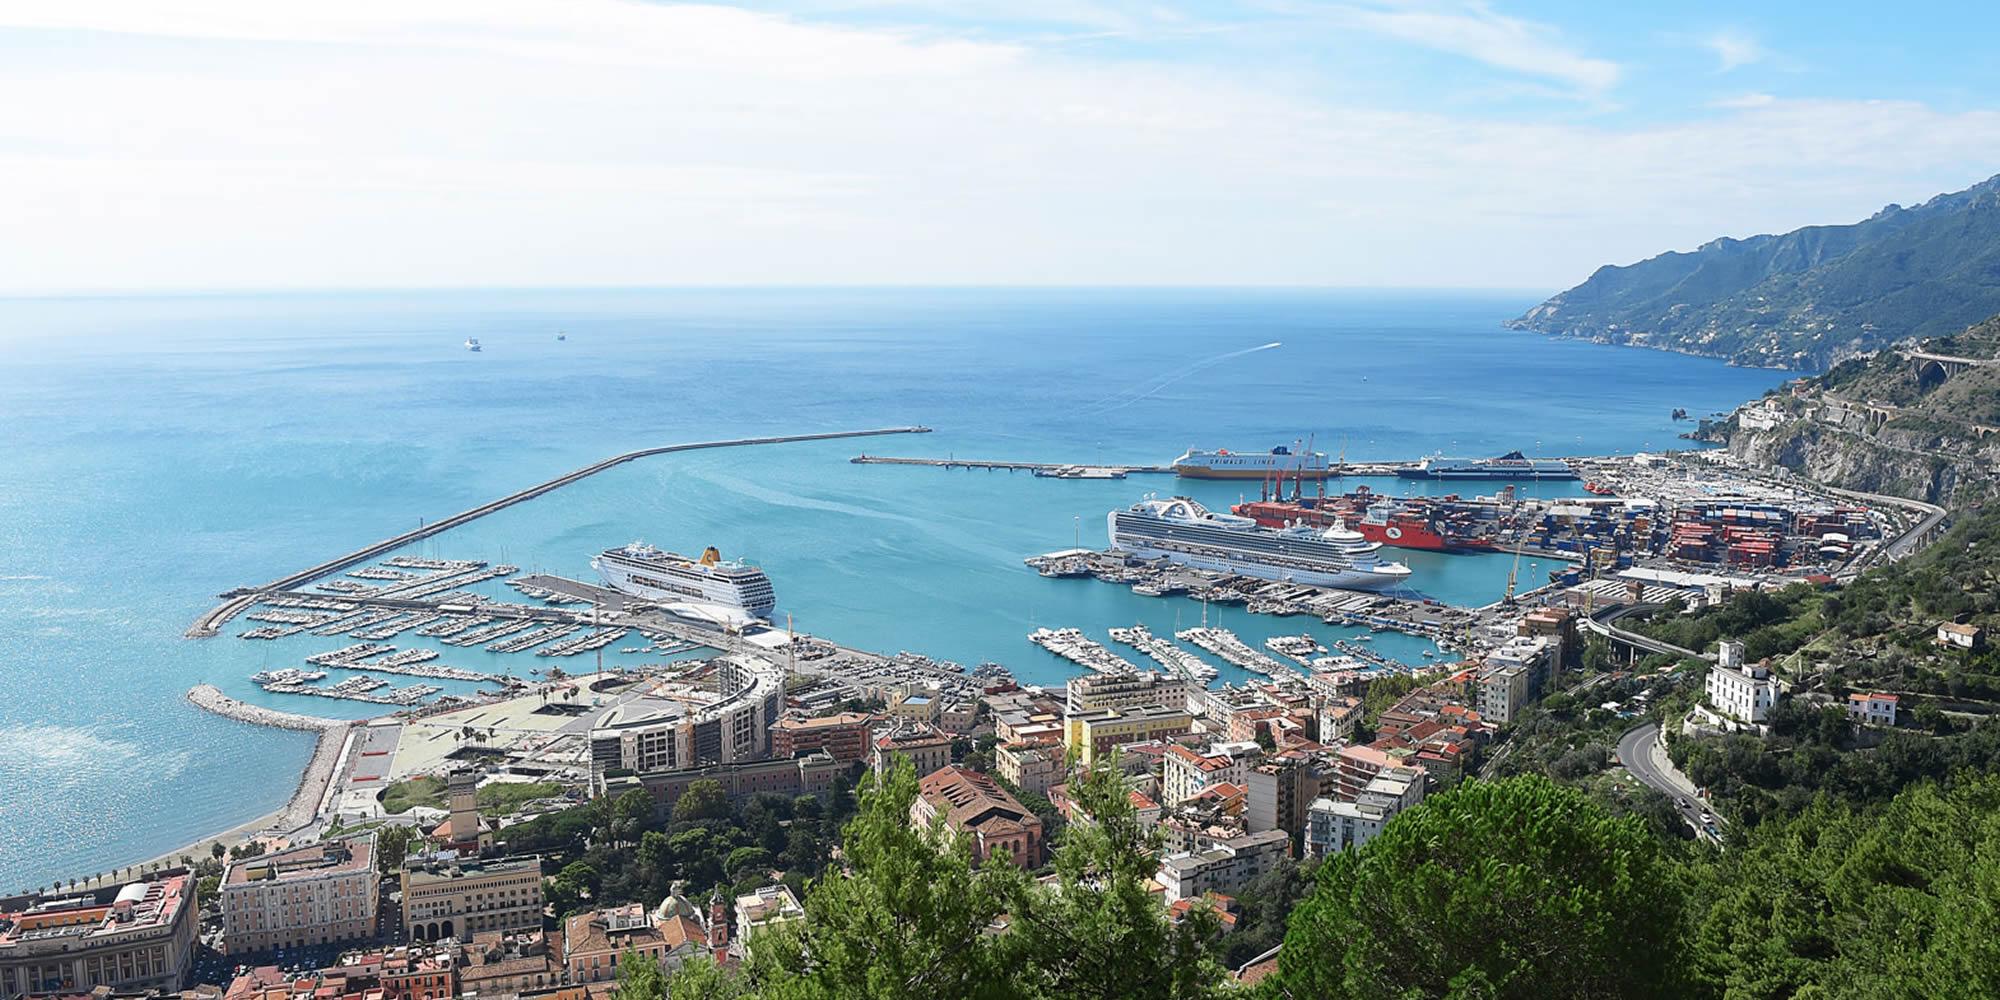 Salerno cruise port